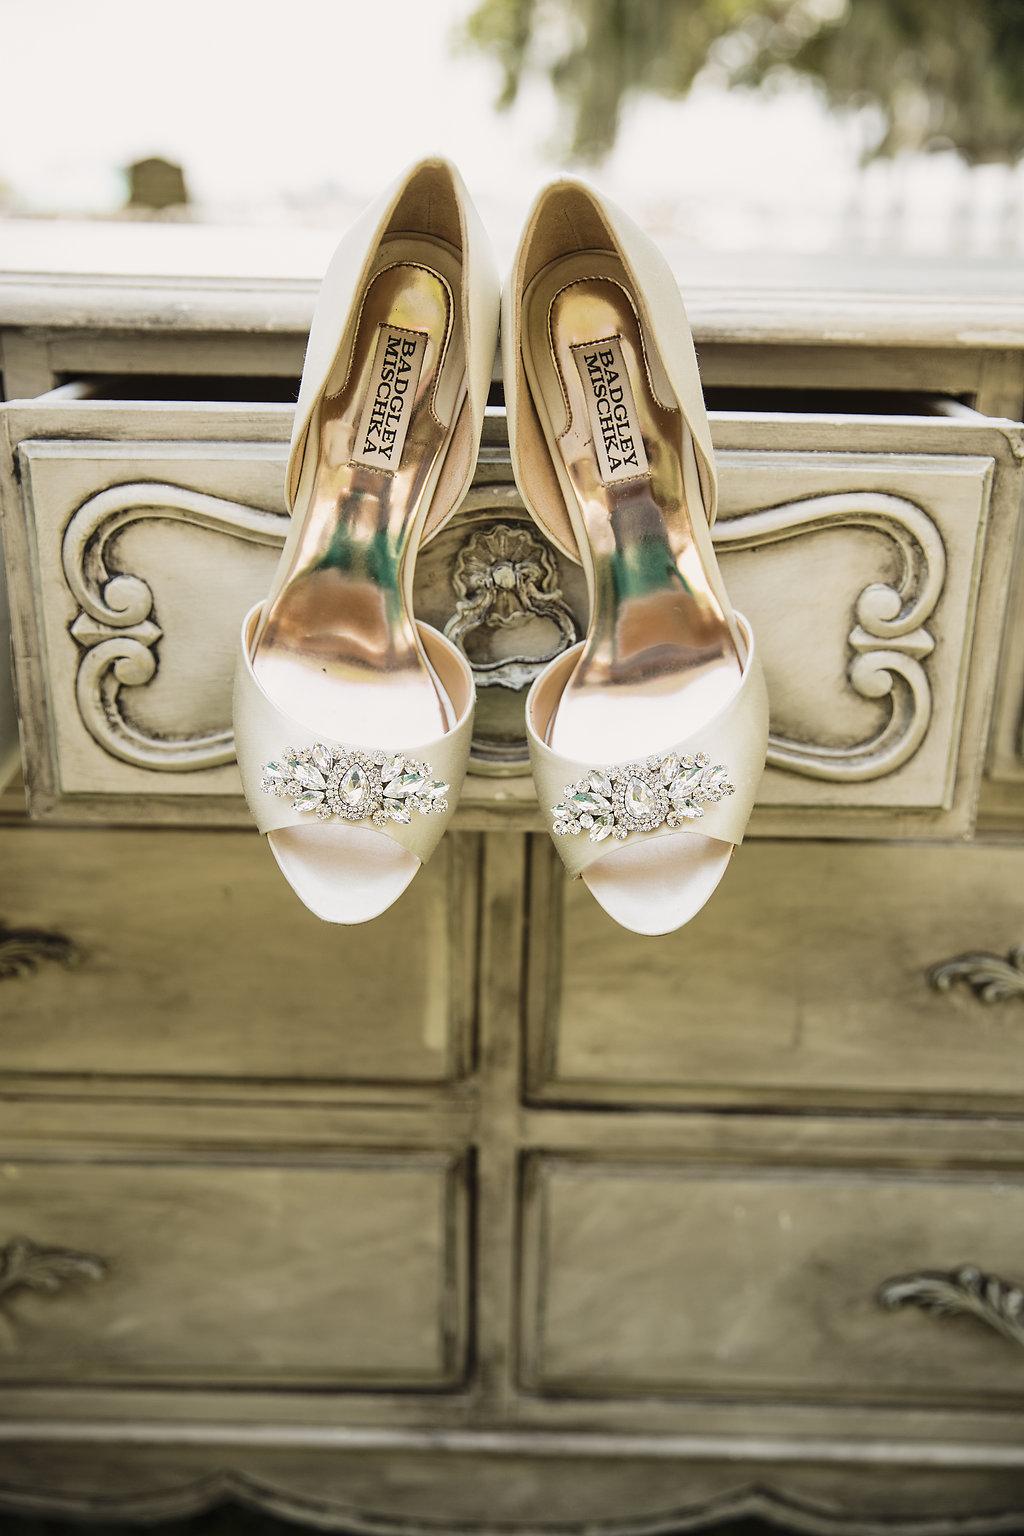 Cream Open Toed Badgley Mischka Wedding Shoes with Rhinestones